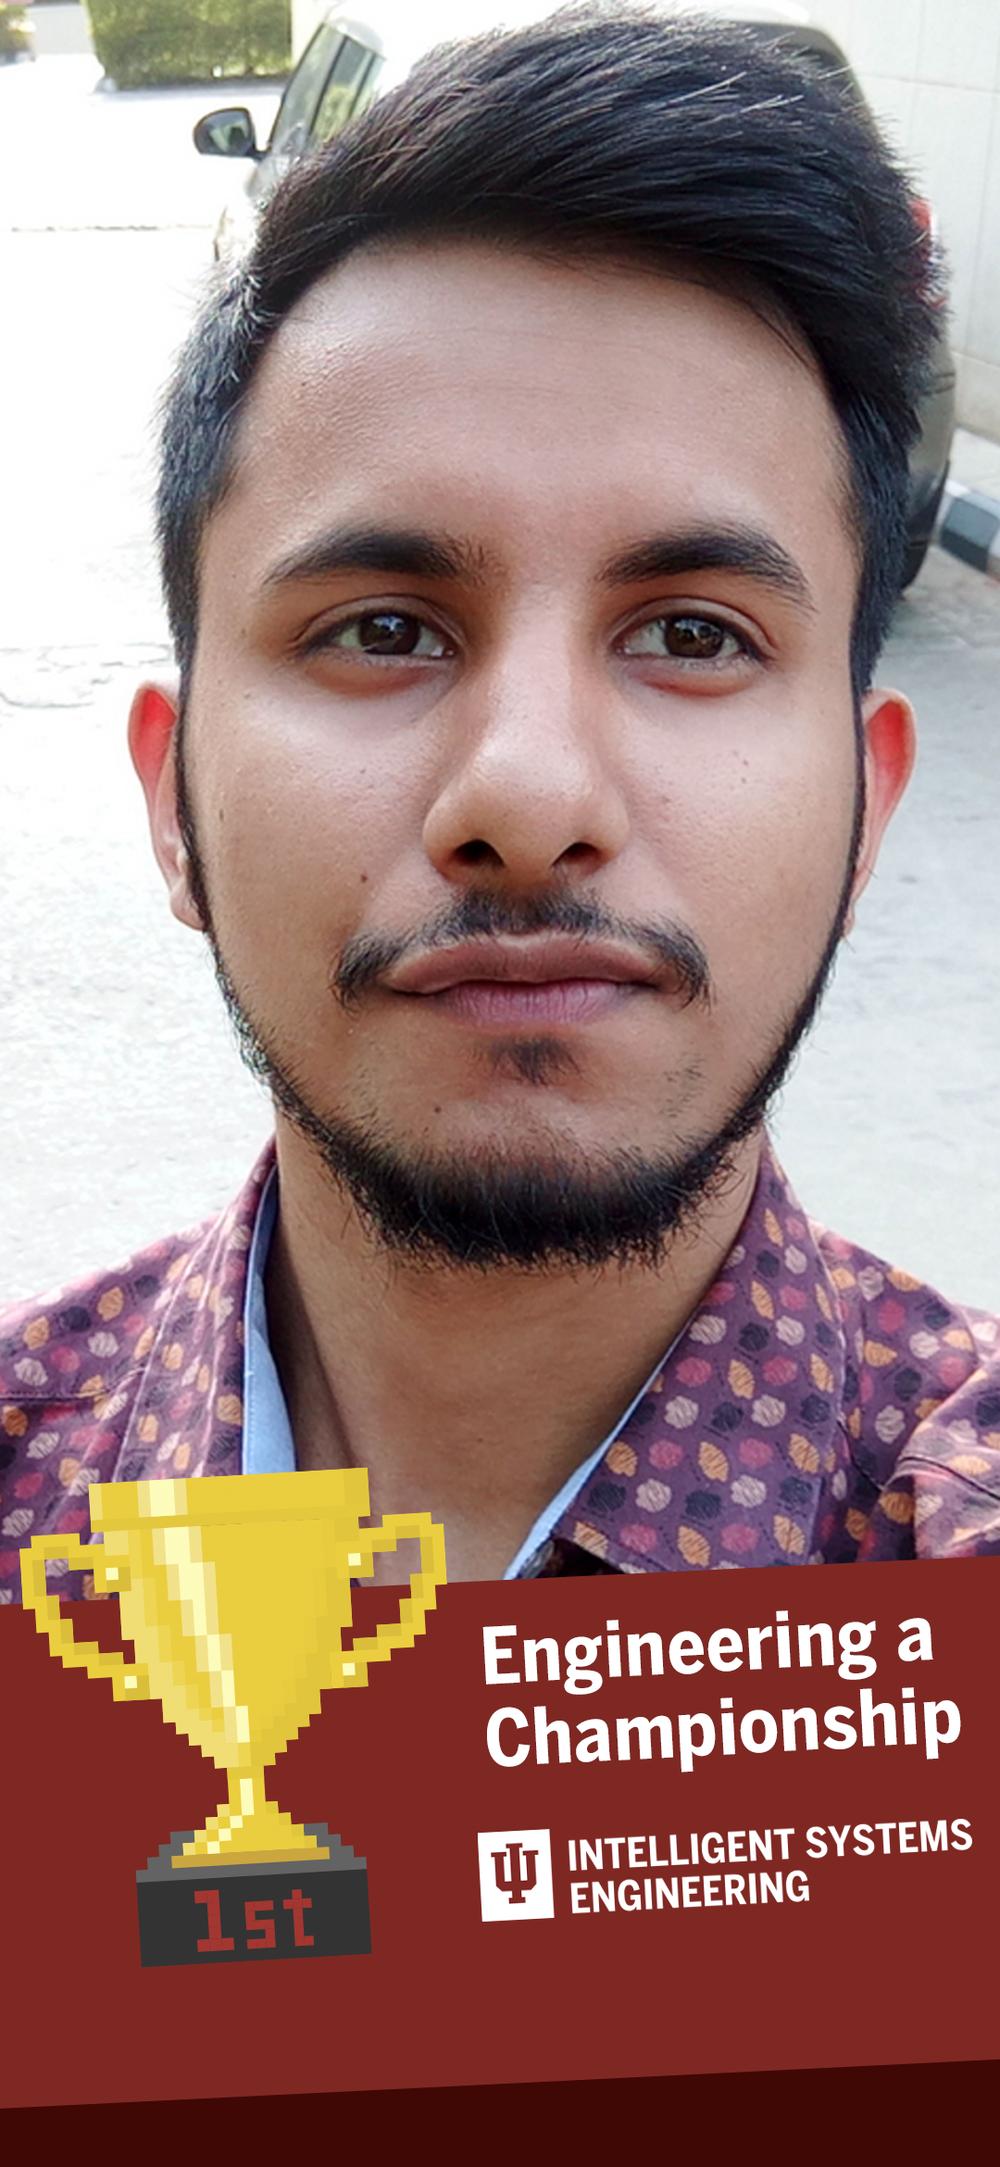 IUSE-Snapchat-Filter-Detroit2.png